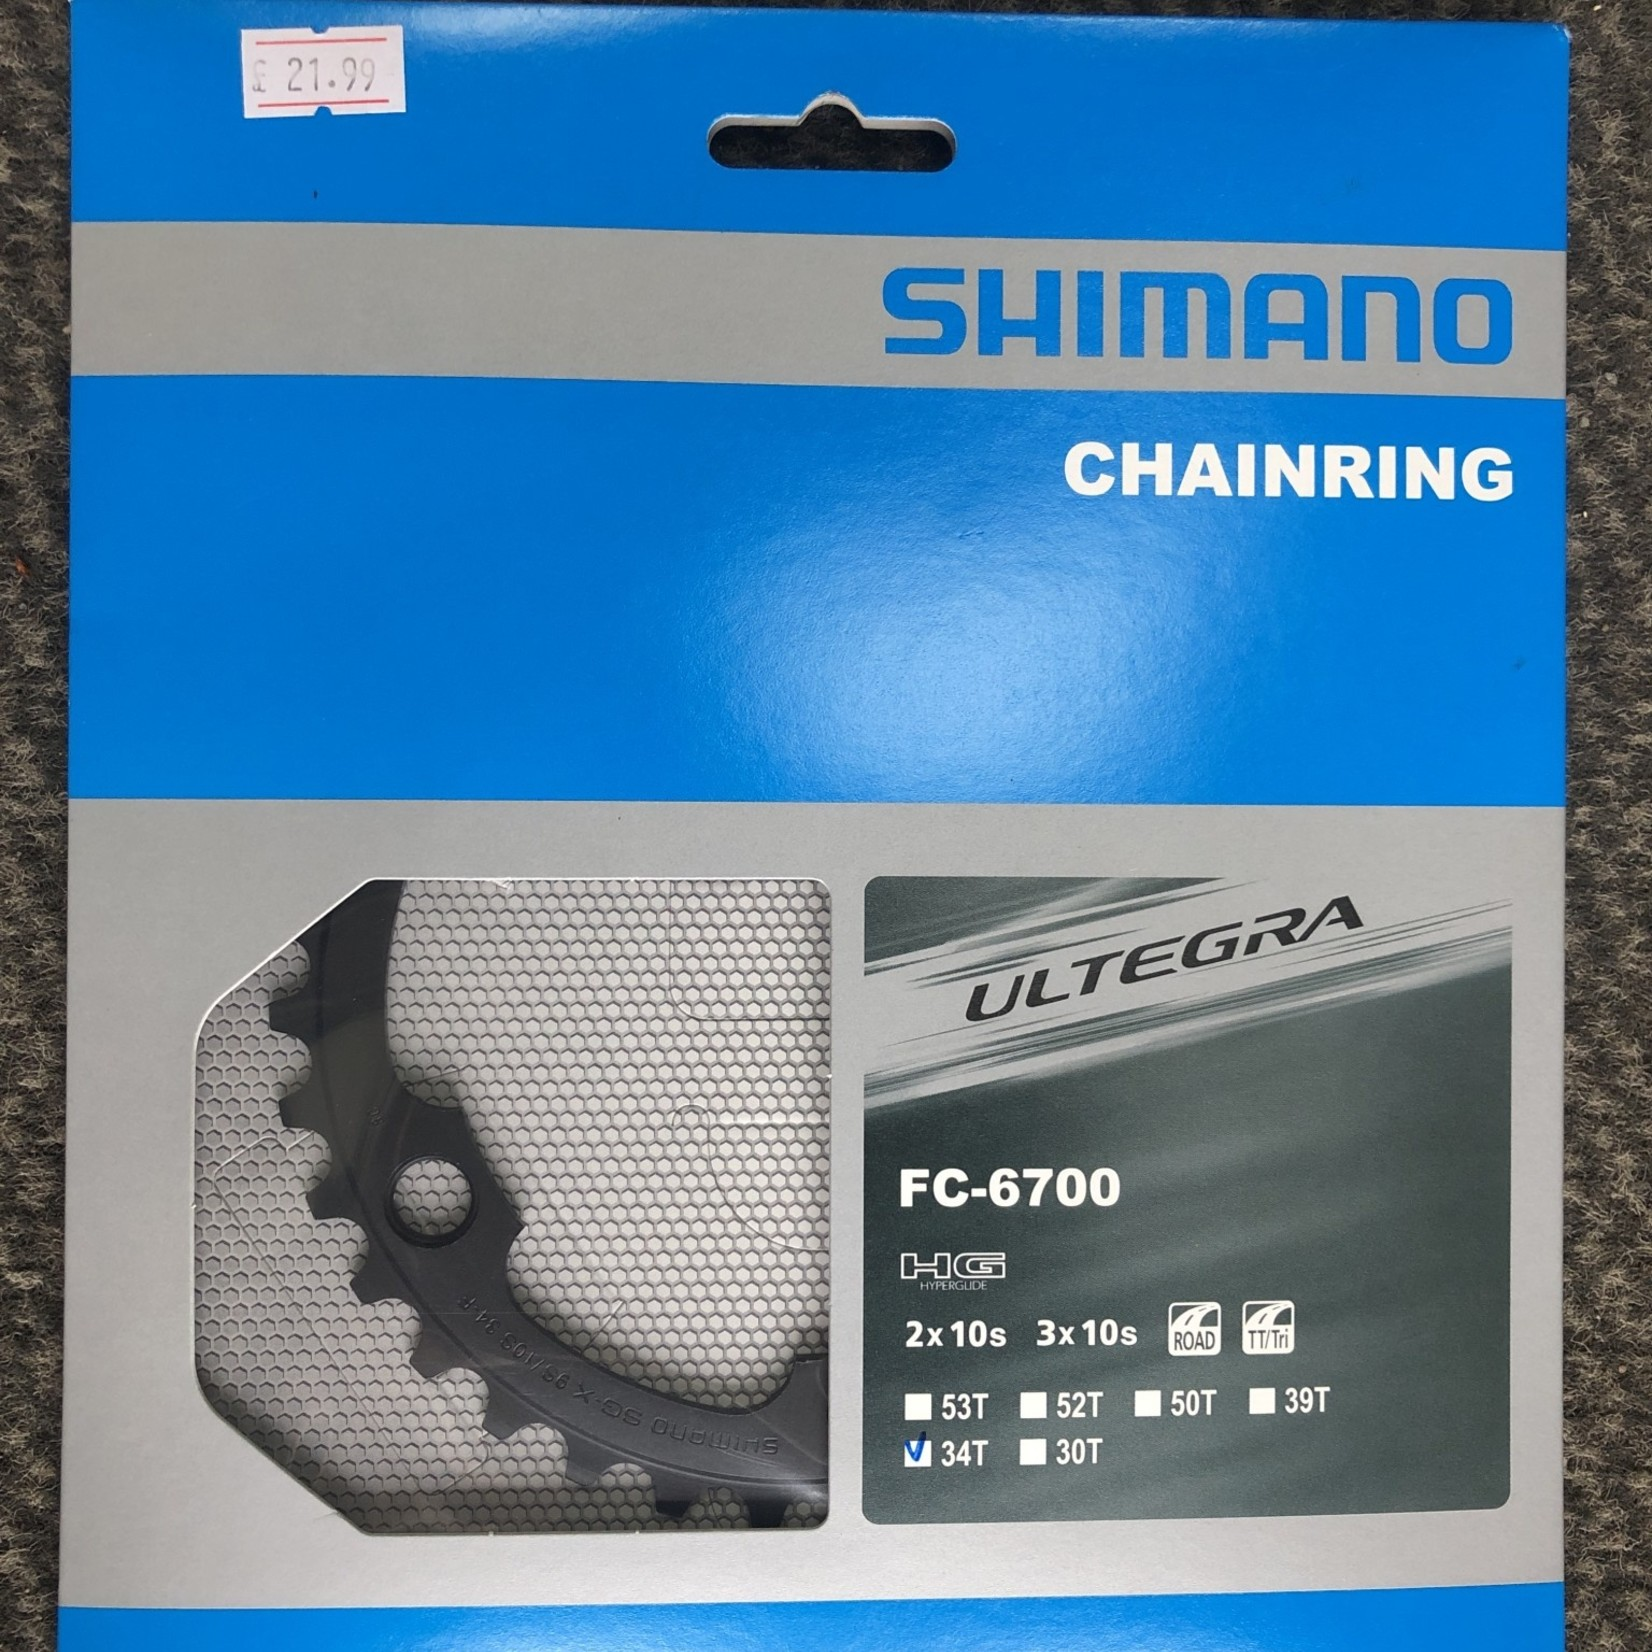 Shimano Shimano Ultegra FC-6750-G chainring 34T, grey